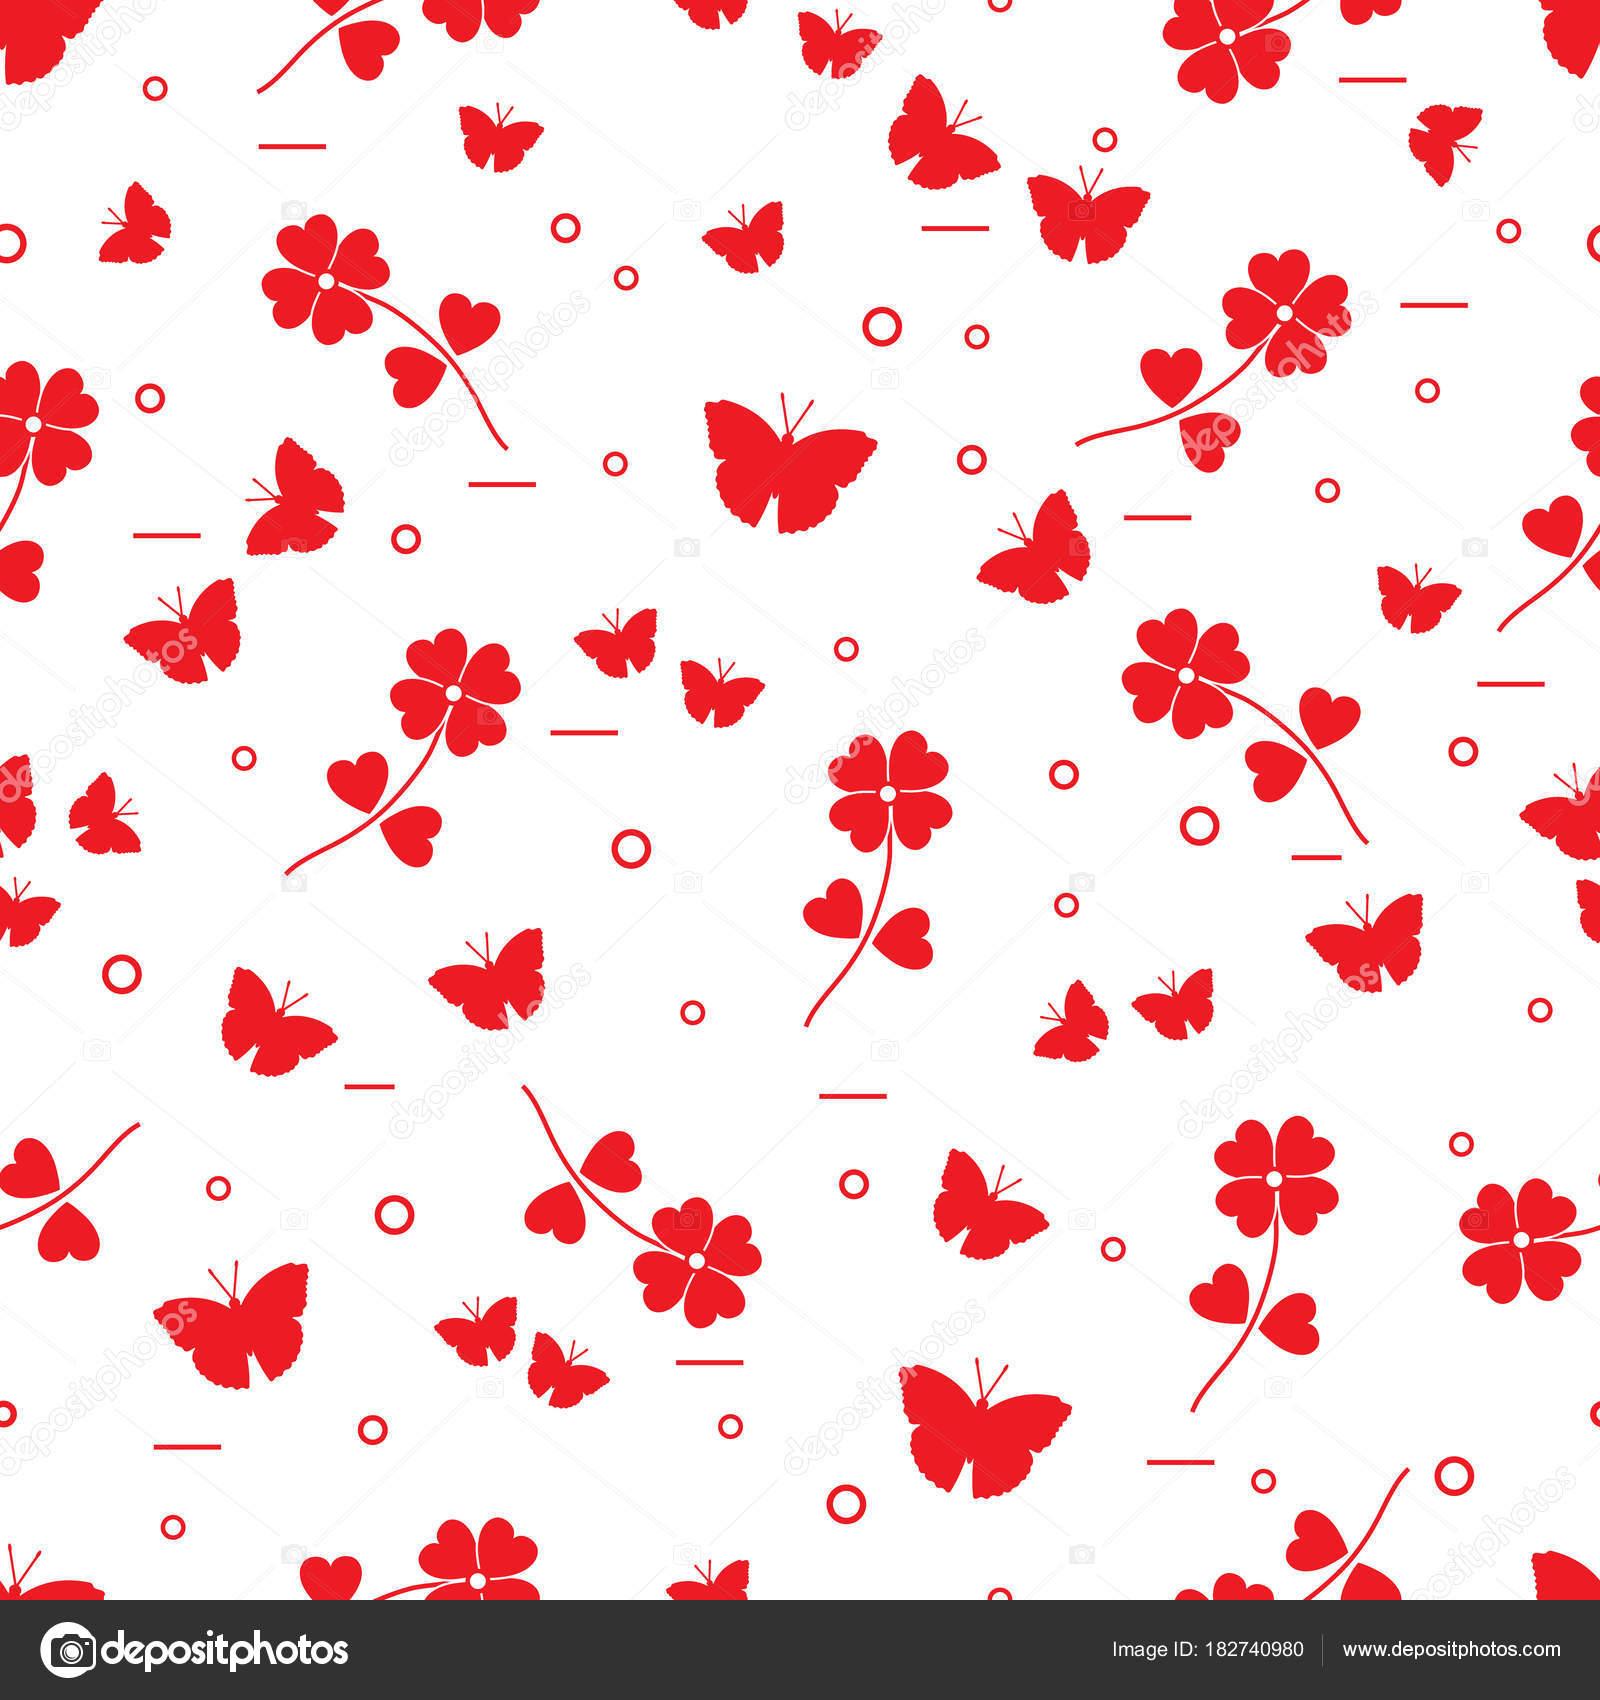 Berühmt Schmetterling Valentin Vorlage Fotos - Entry Level Resume ...